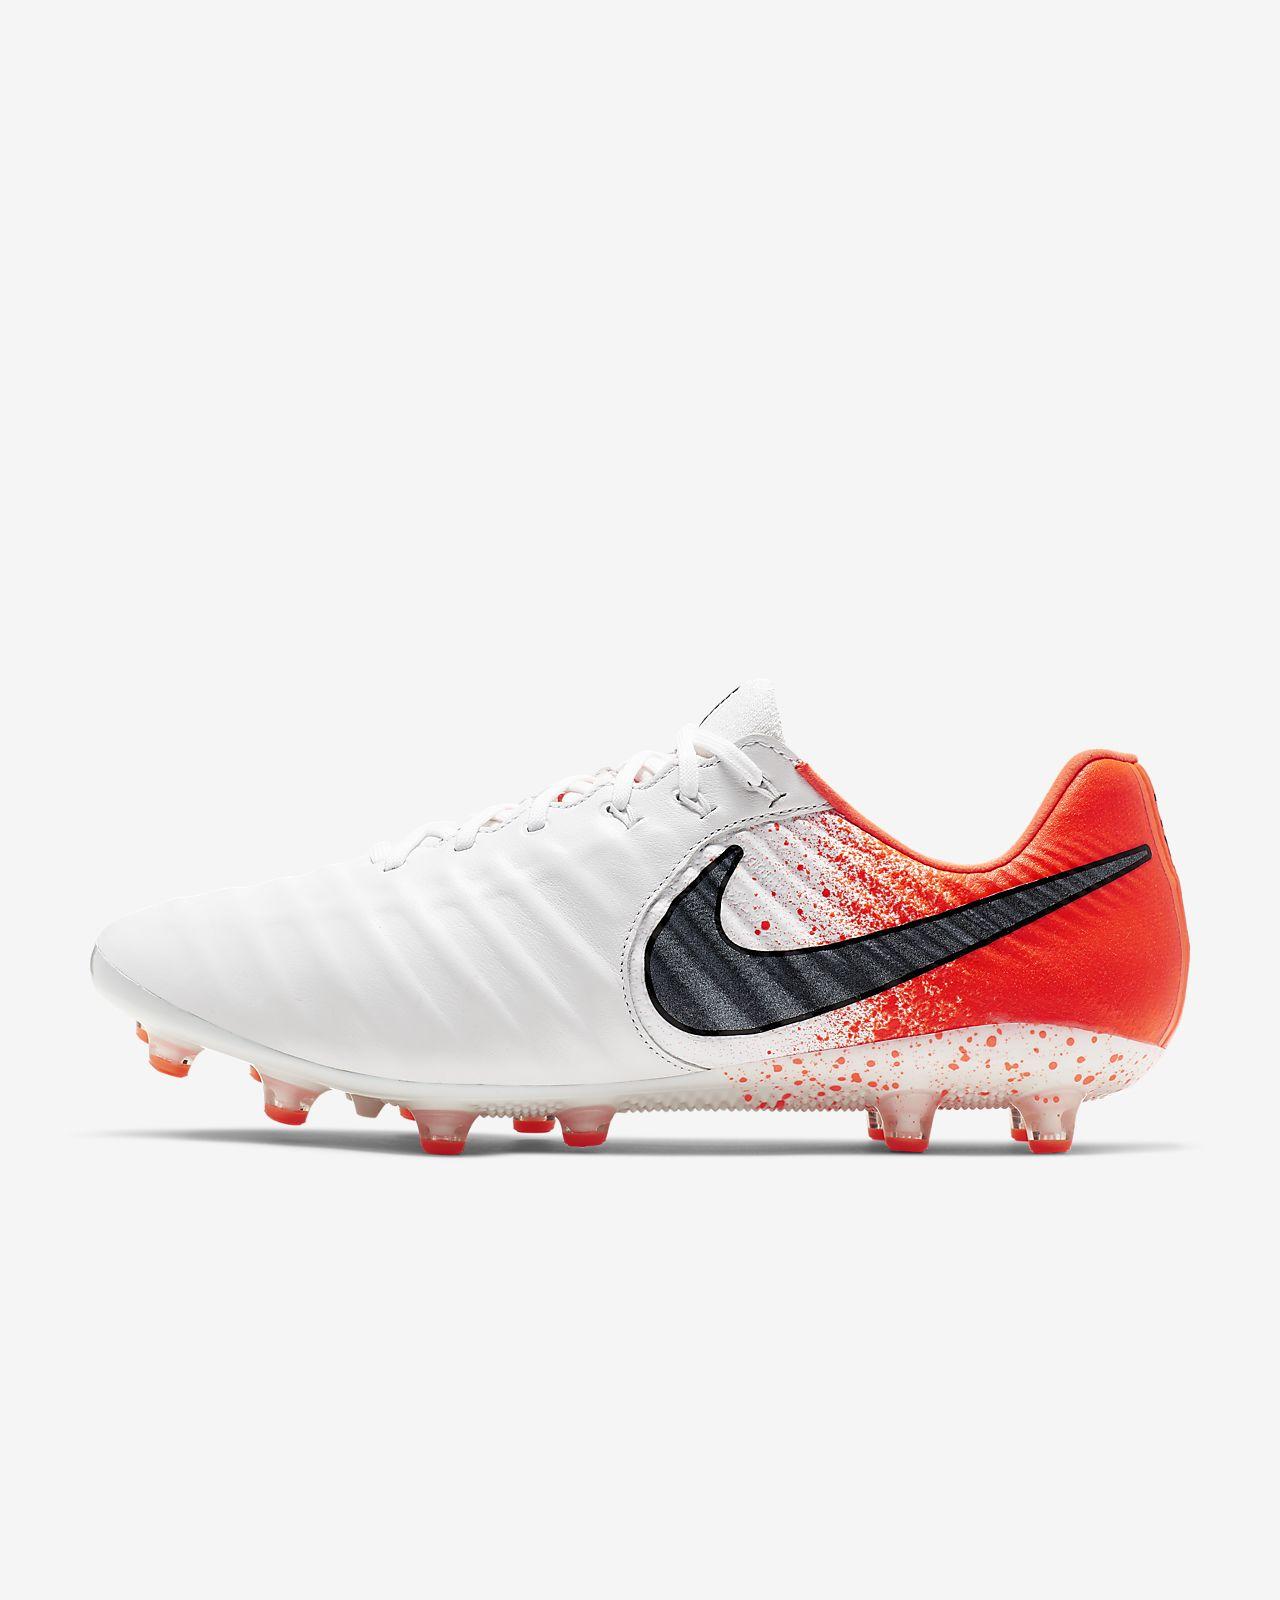 half off 4a6c2 3a7a5 ... Nike Legend VII Elite AG-PRO Botas de fútbol para césped artificial